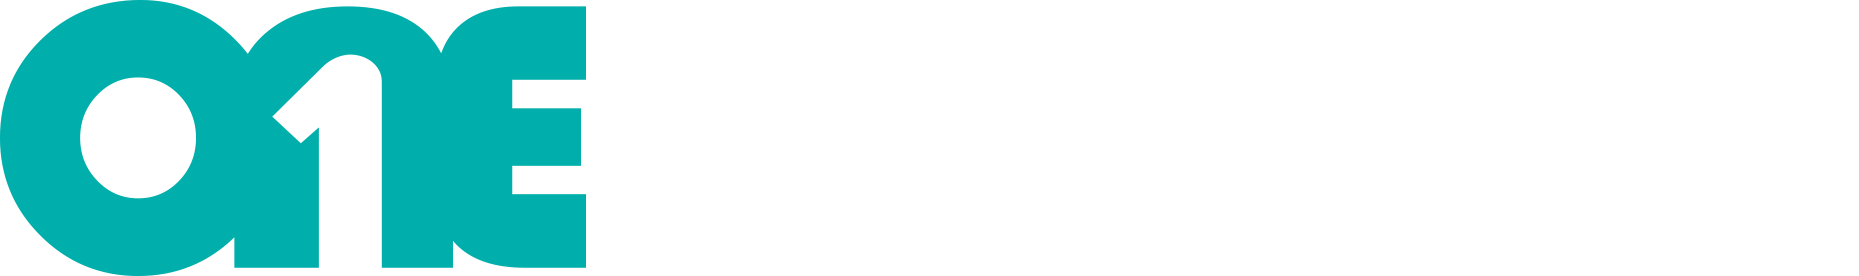 OneShopping ApS